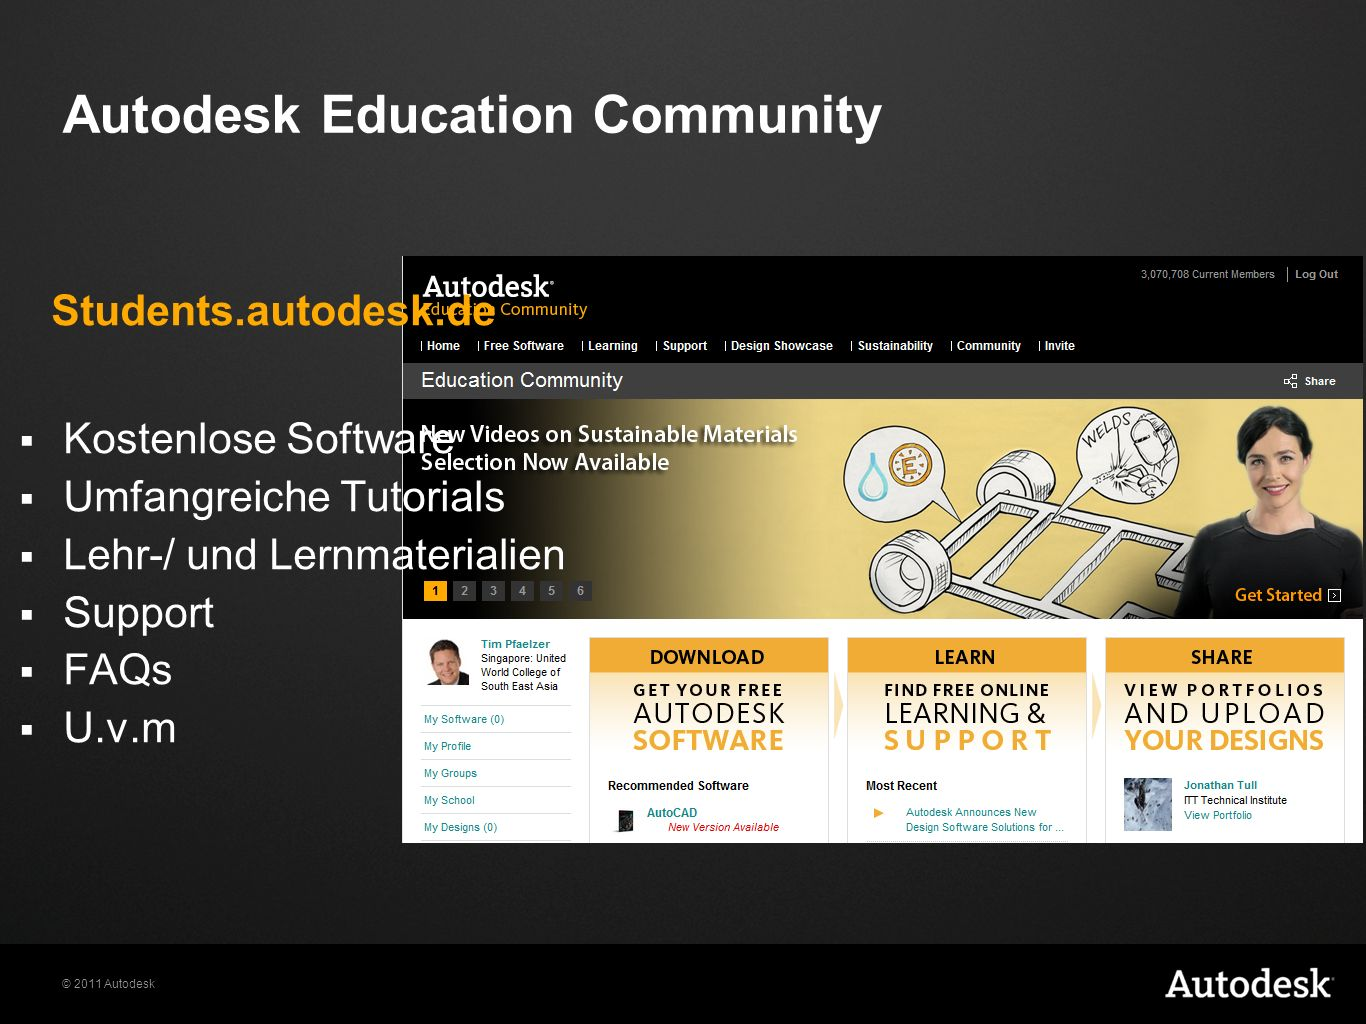 © 2011 Autodesk Autodesk Education Community Kostenlose Software Umfangreiche Tutorials Lehr-/ und Lernmaterialien Support FAQs U.v.m Students.autodesk.de